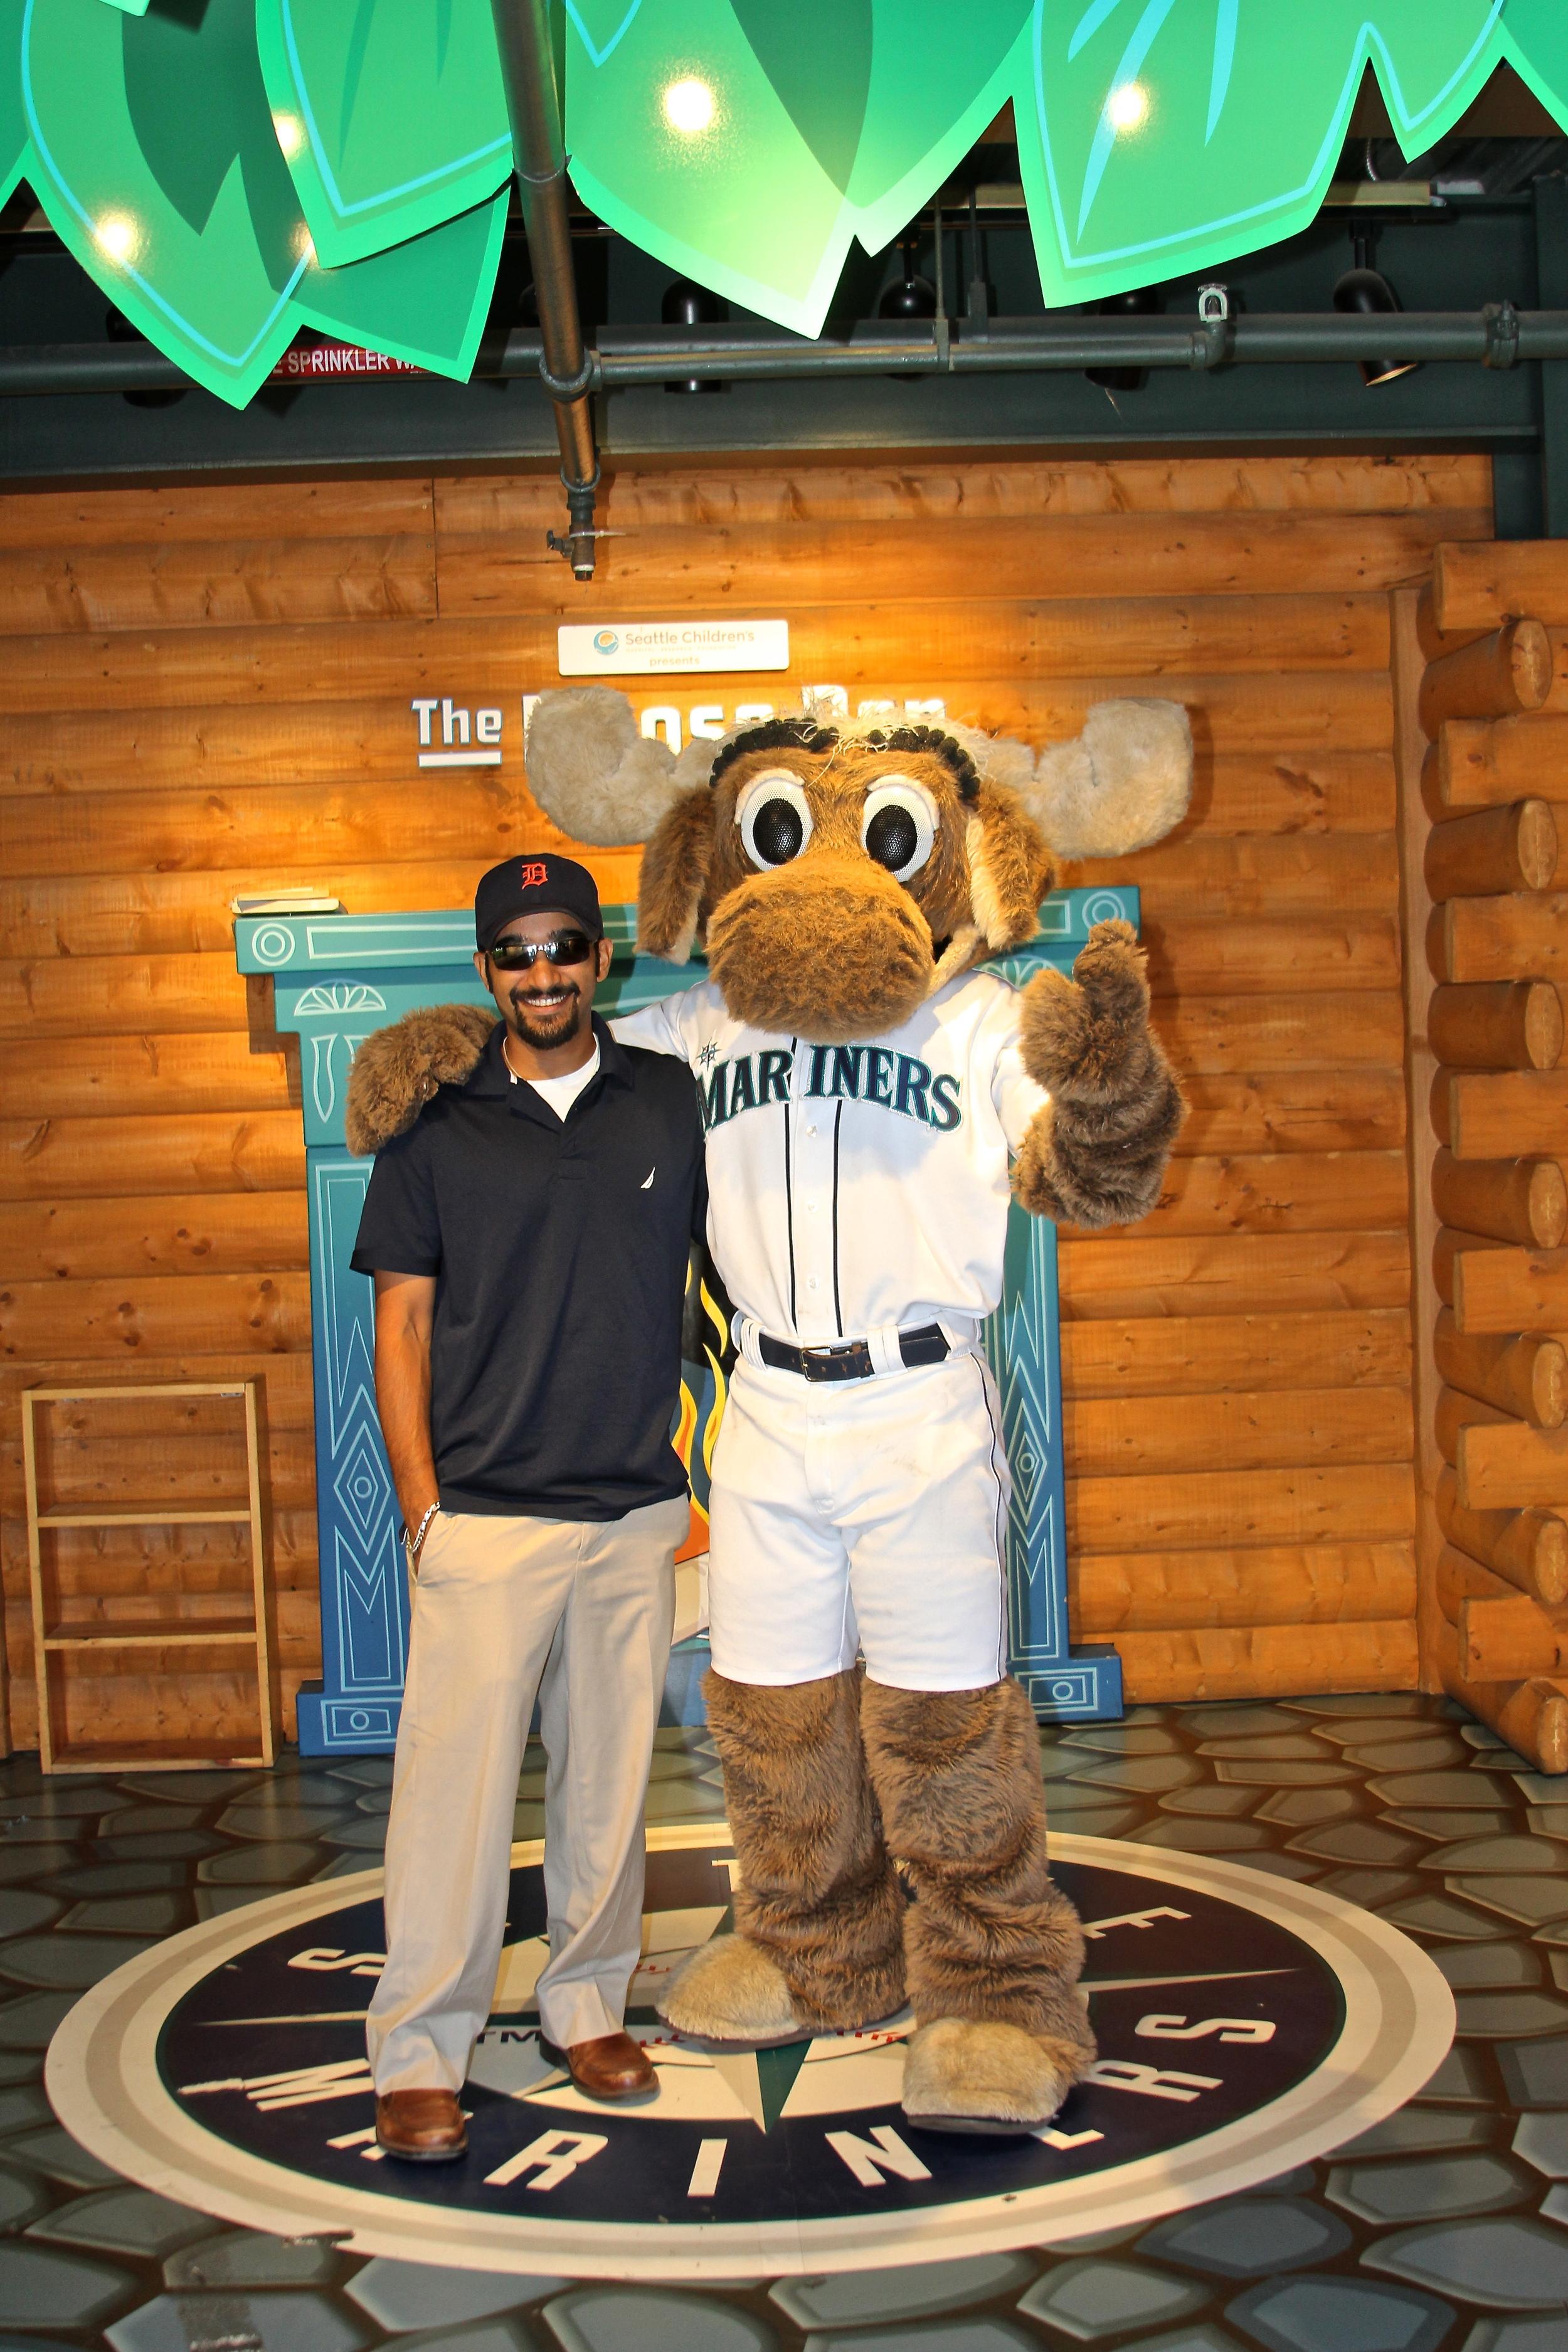 Me and Mariner Moose